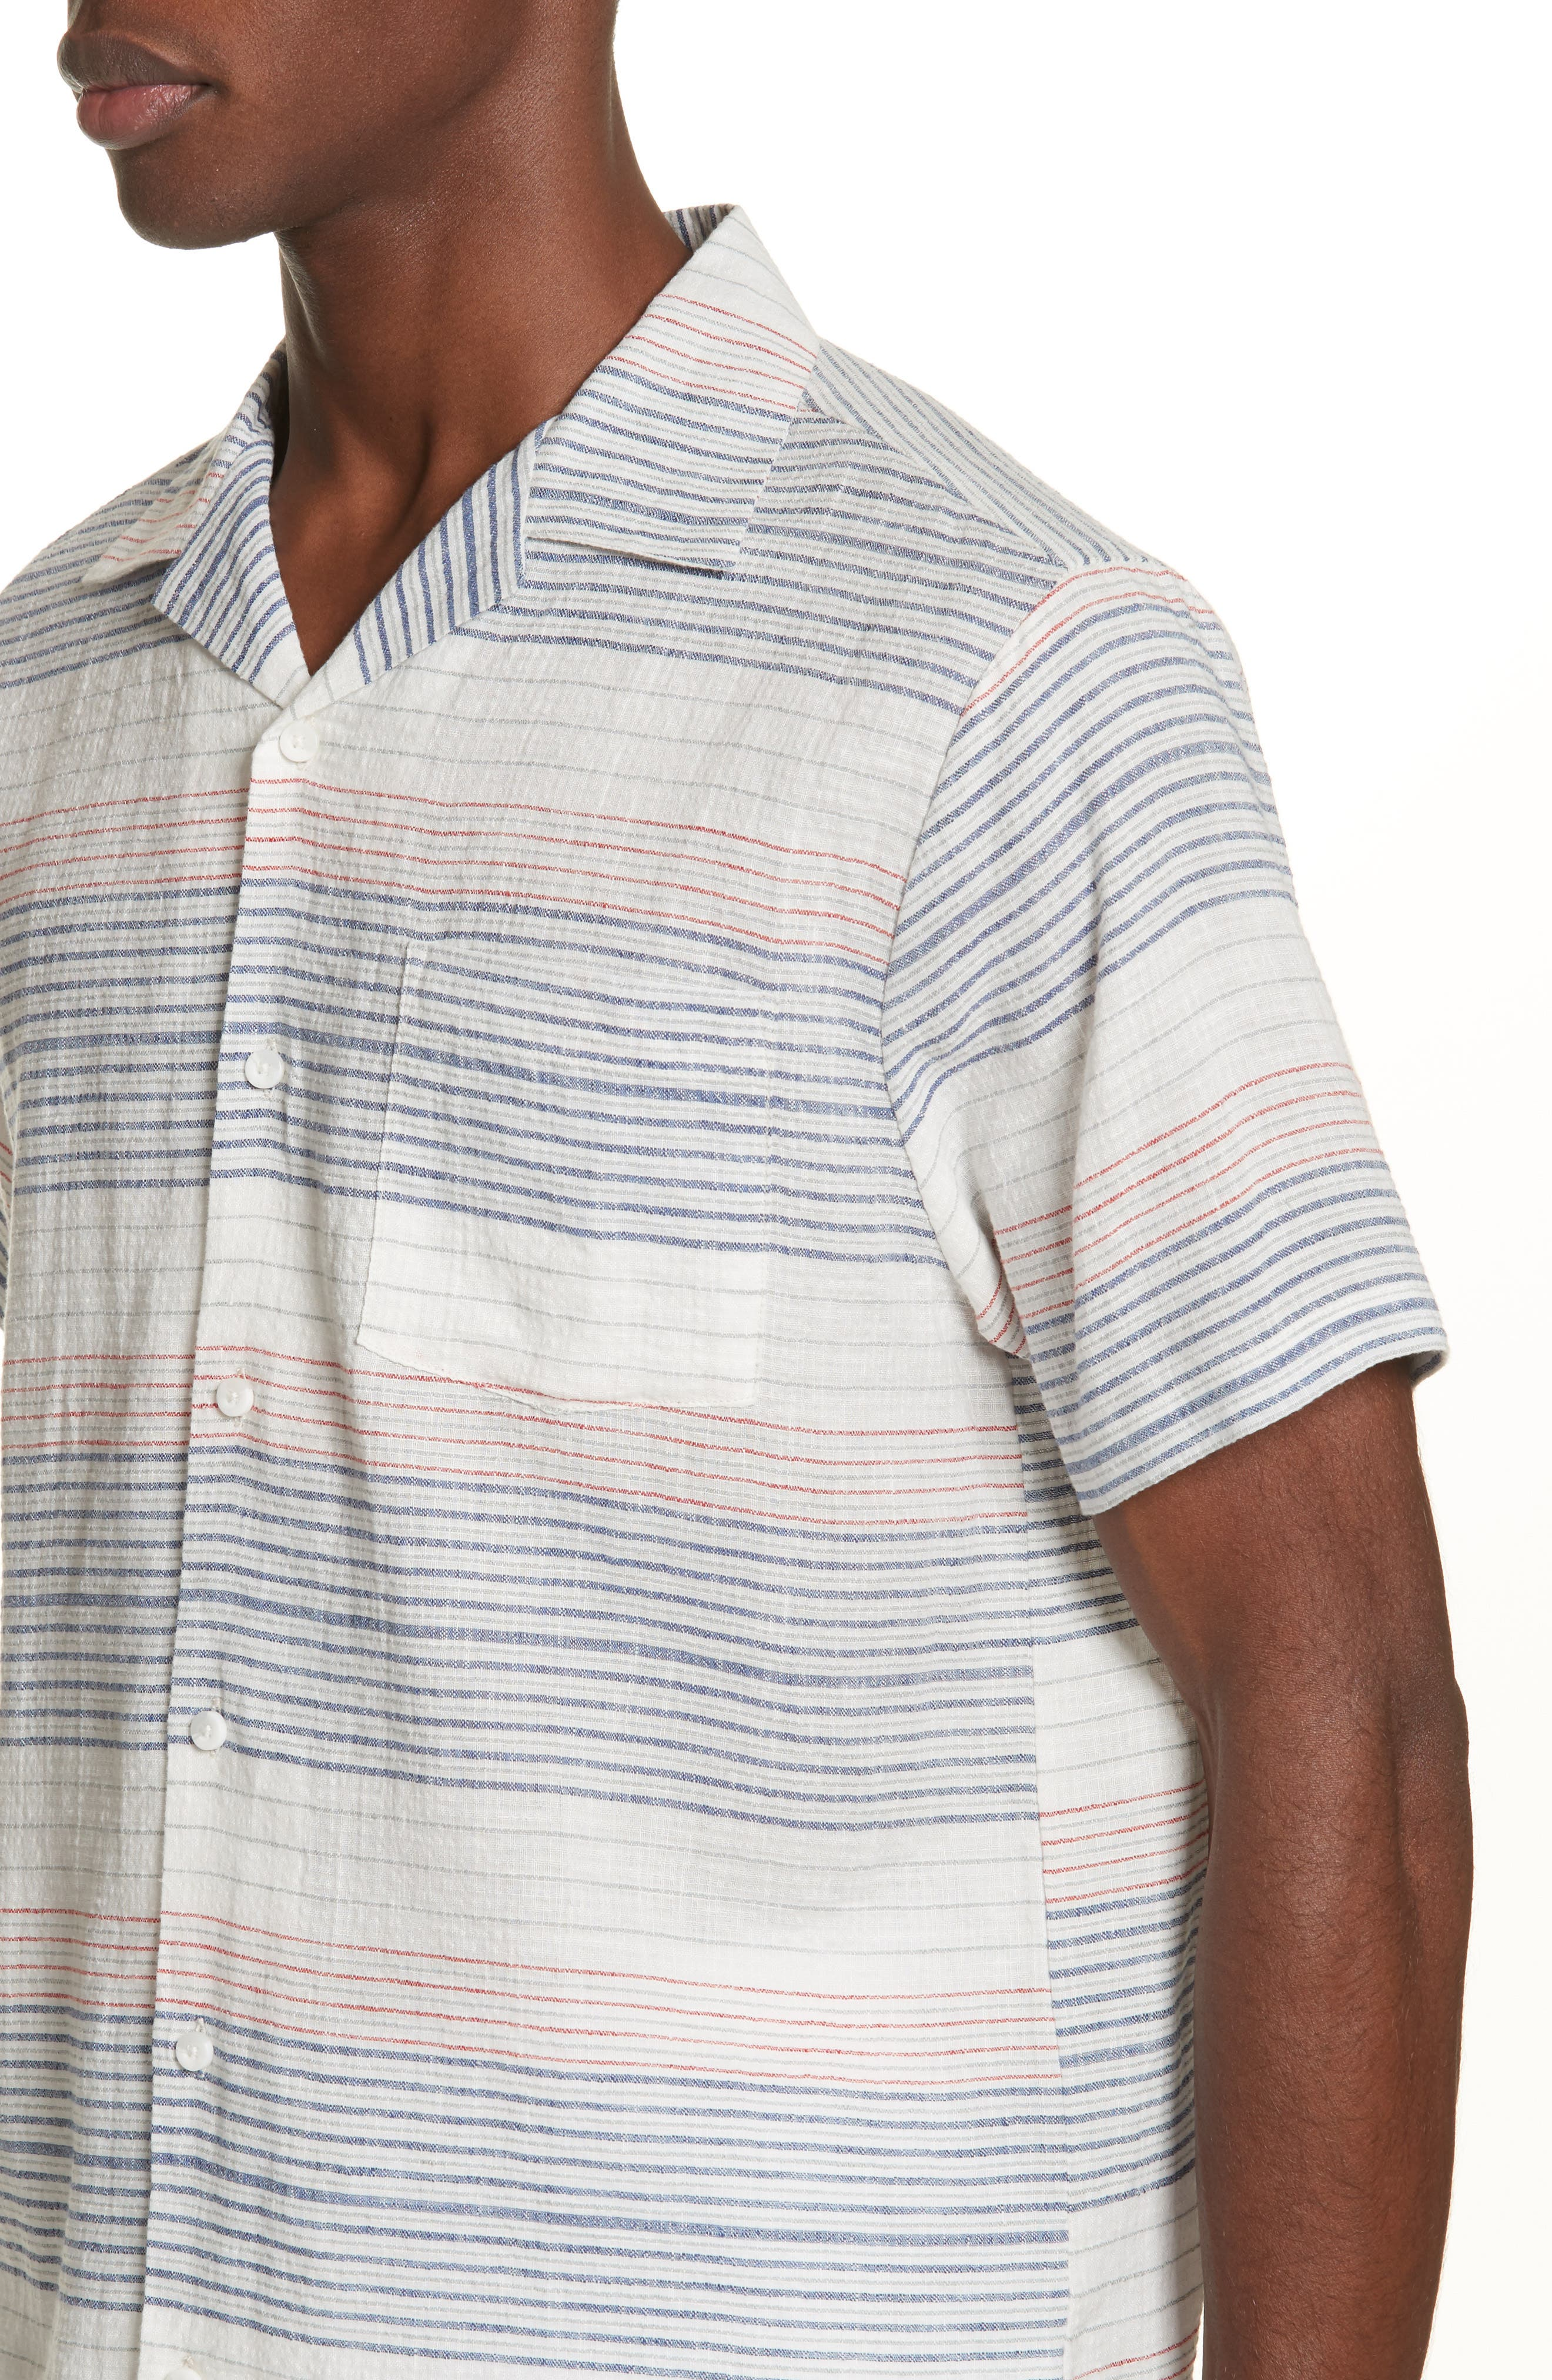 Americana Stripe Woven Camp Shirt,                             Alternate thumbnail 4, color,                             960